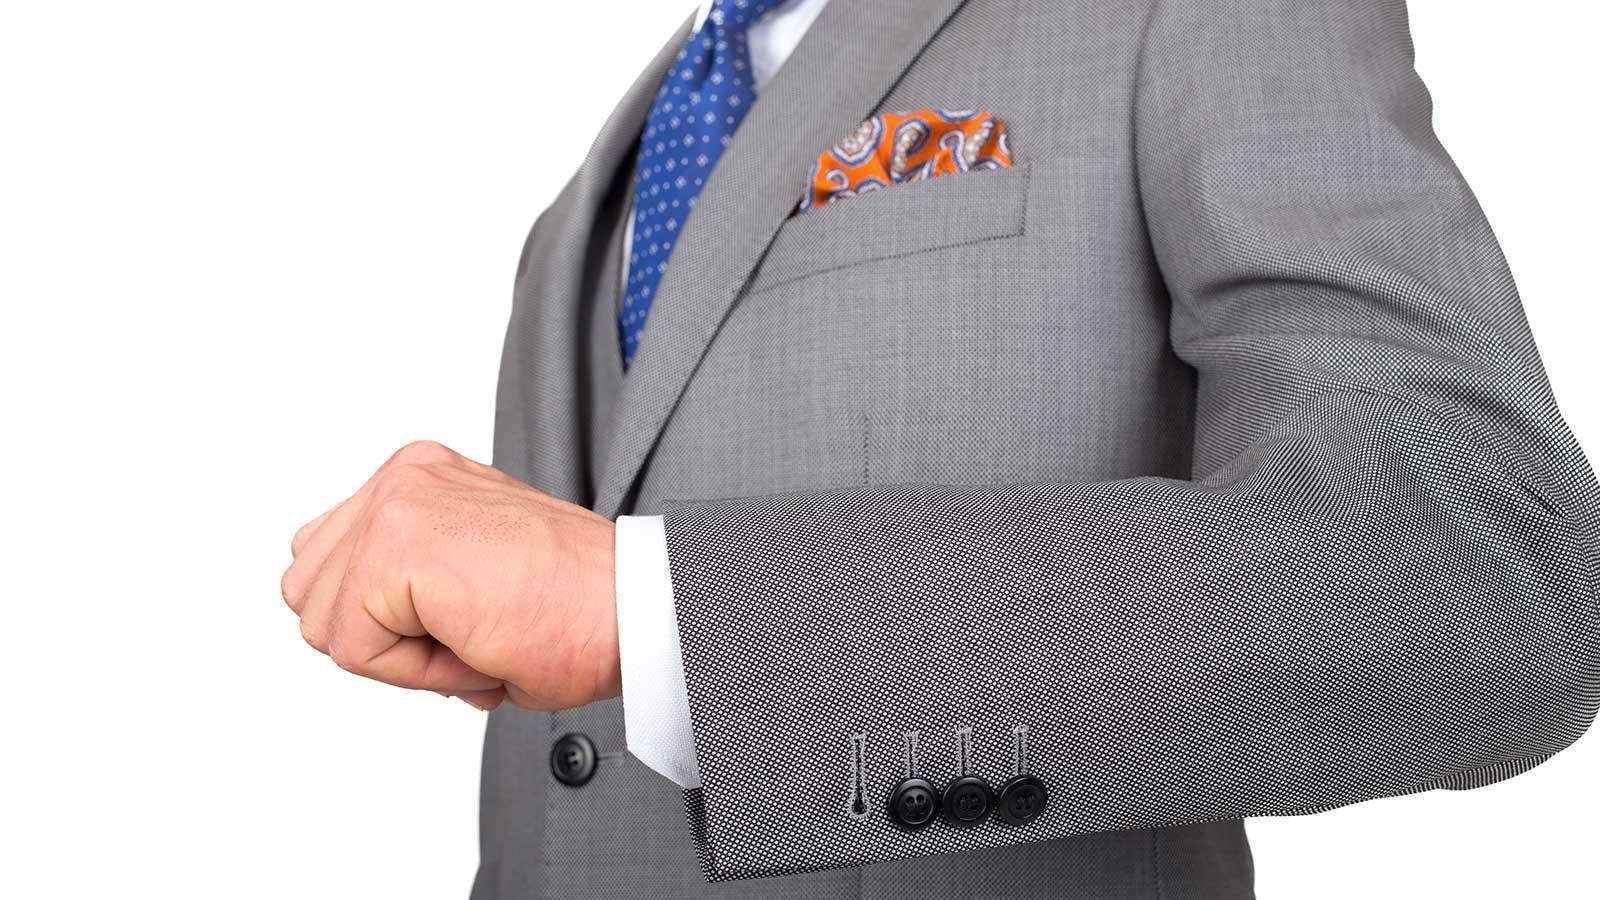 Premium Grey Birdseye Suit - slider image 1